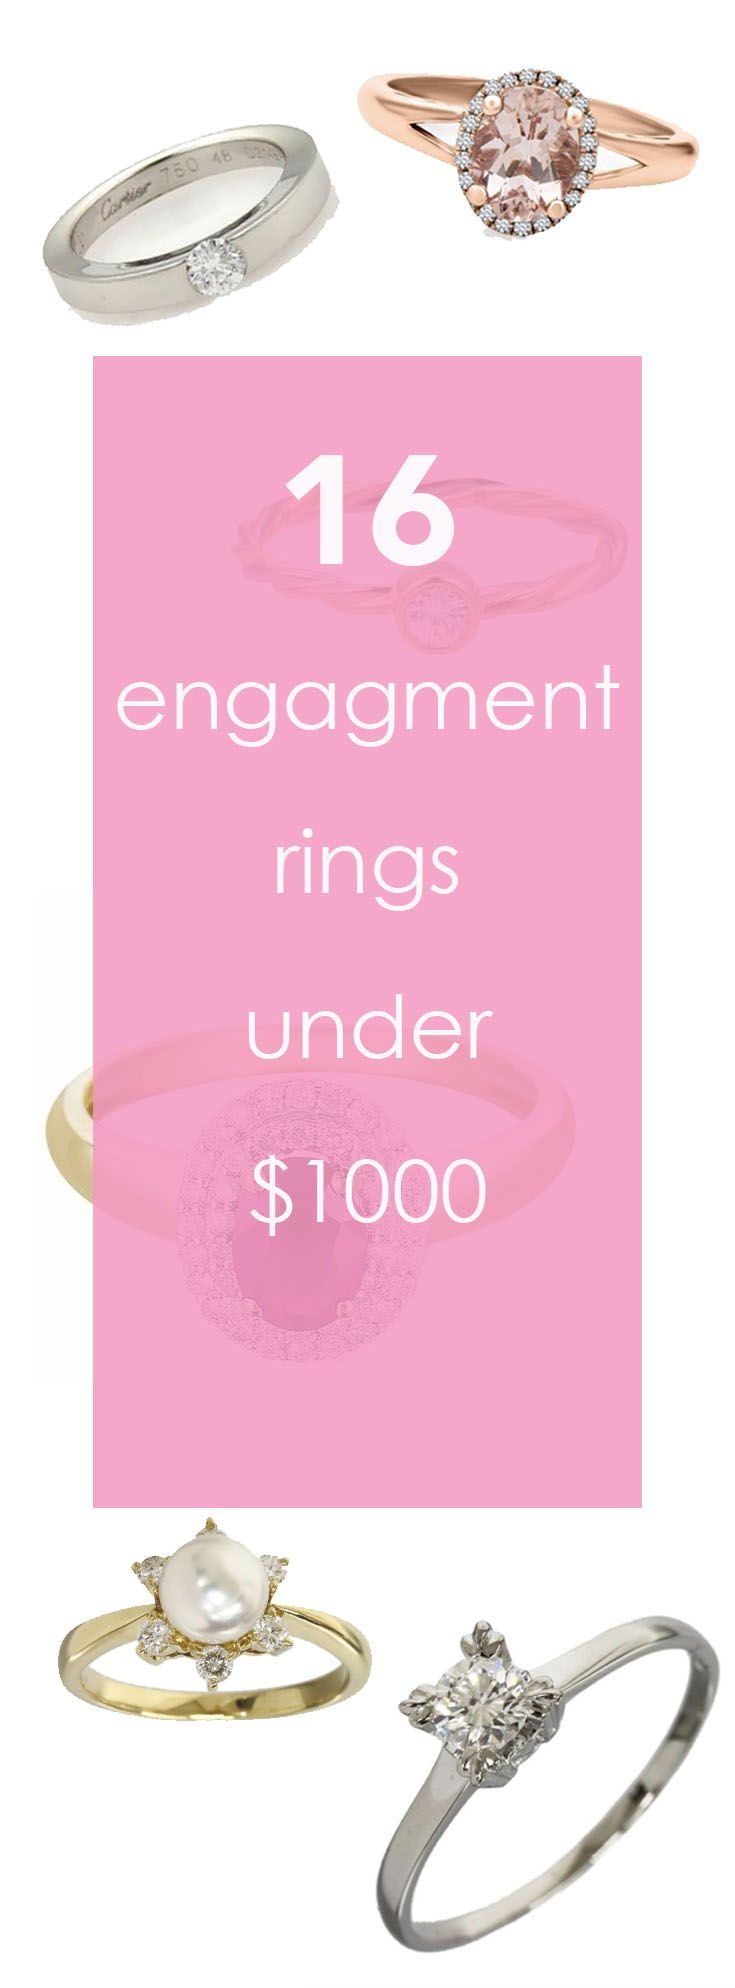 1804 best Kiss the Bride images on Pinterest | Engagements ...